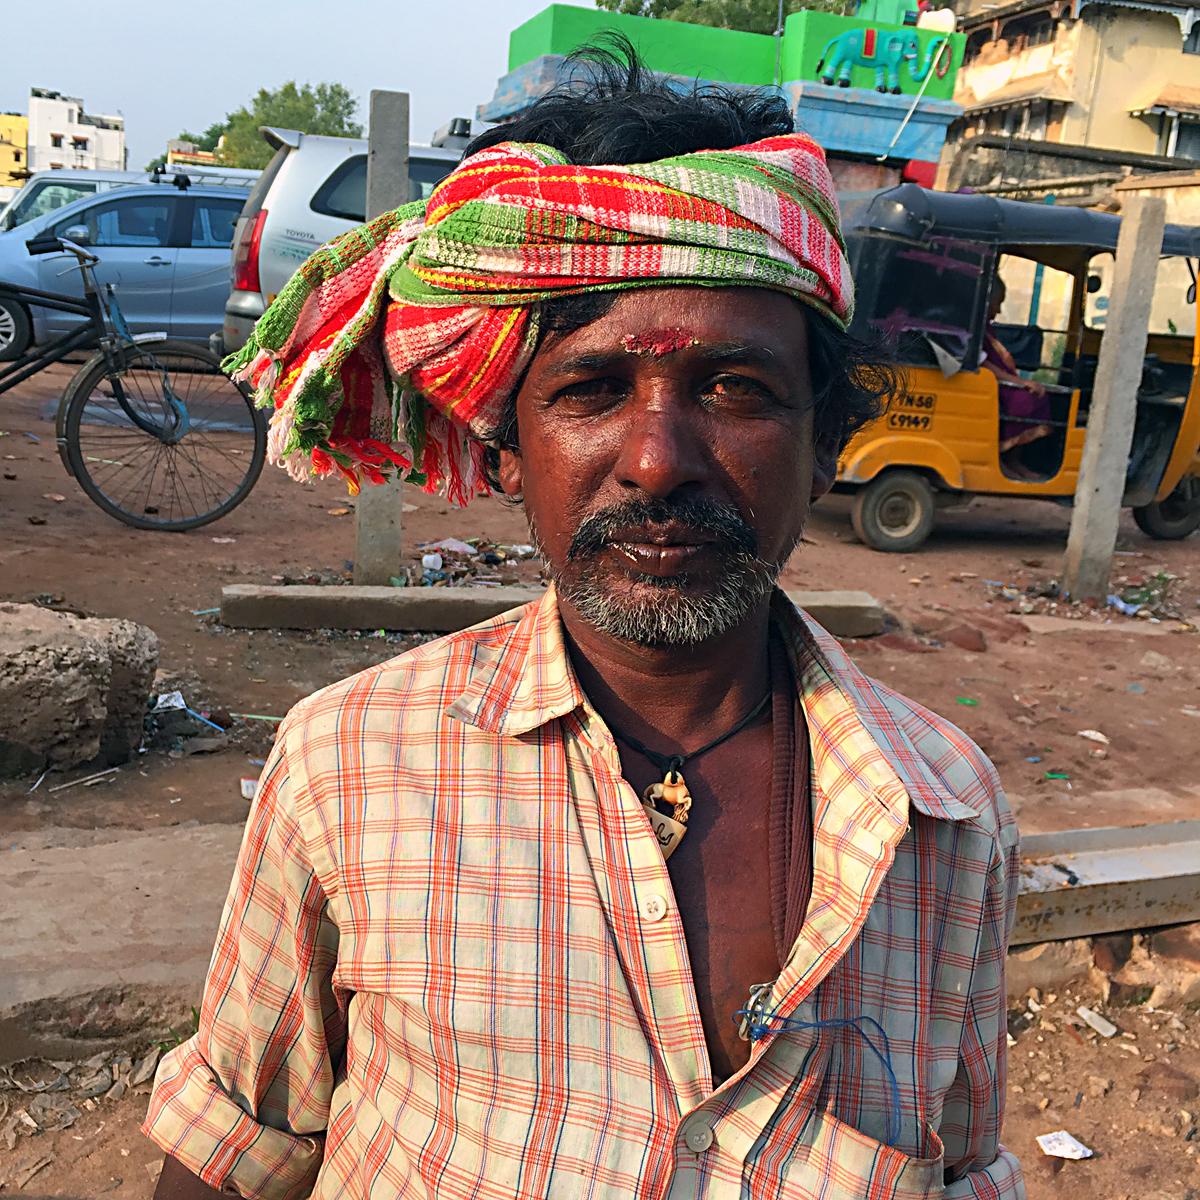 INDIEN Chennai Kanchipuram Tempel Menschen Tempel FINEST-onTour 2167.jpg